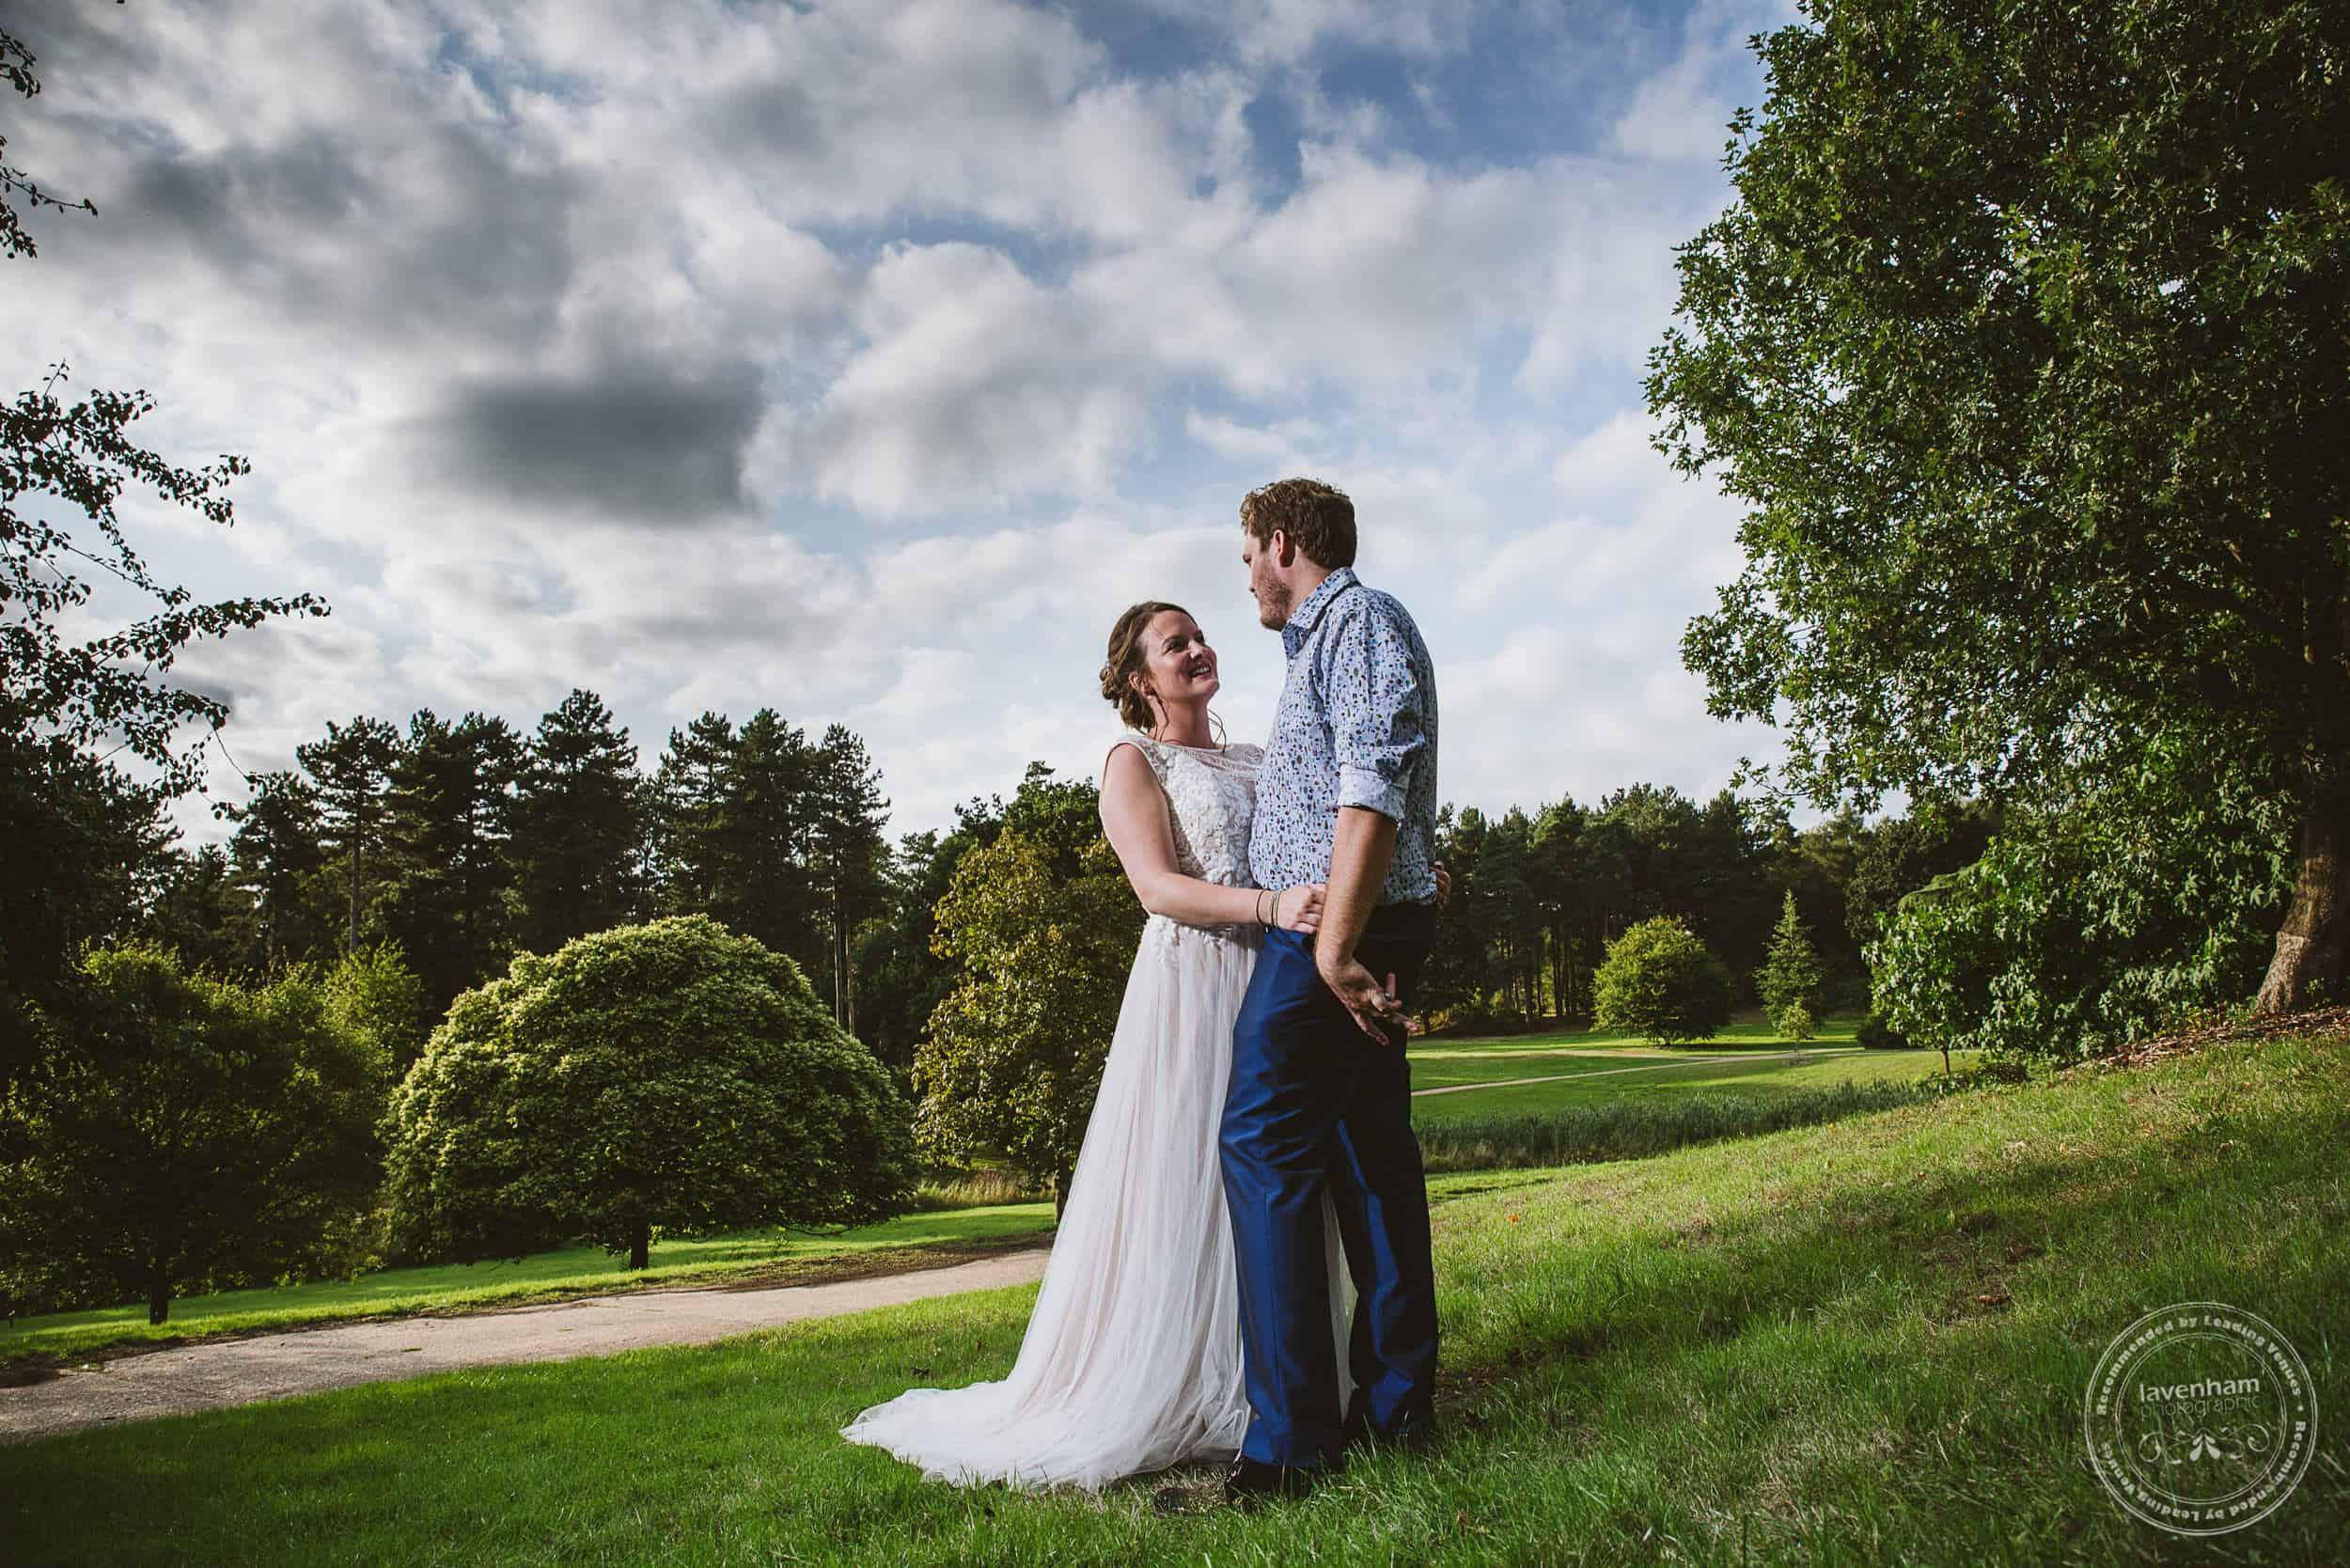 180818 Marks Hall Wedding Photography Lavenham Photographic 127